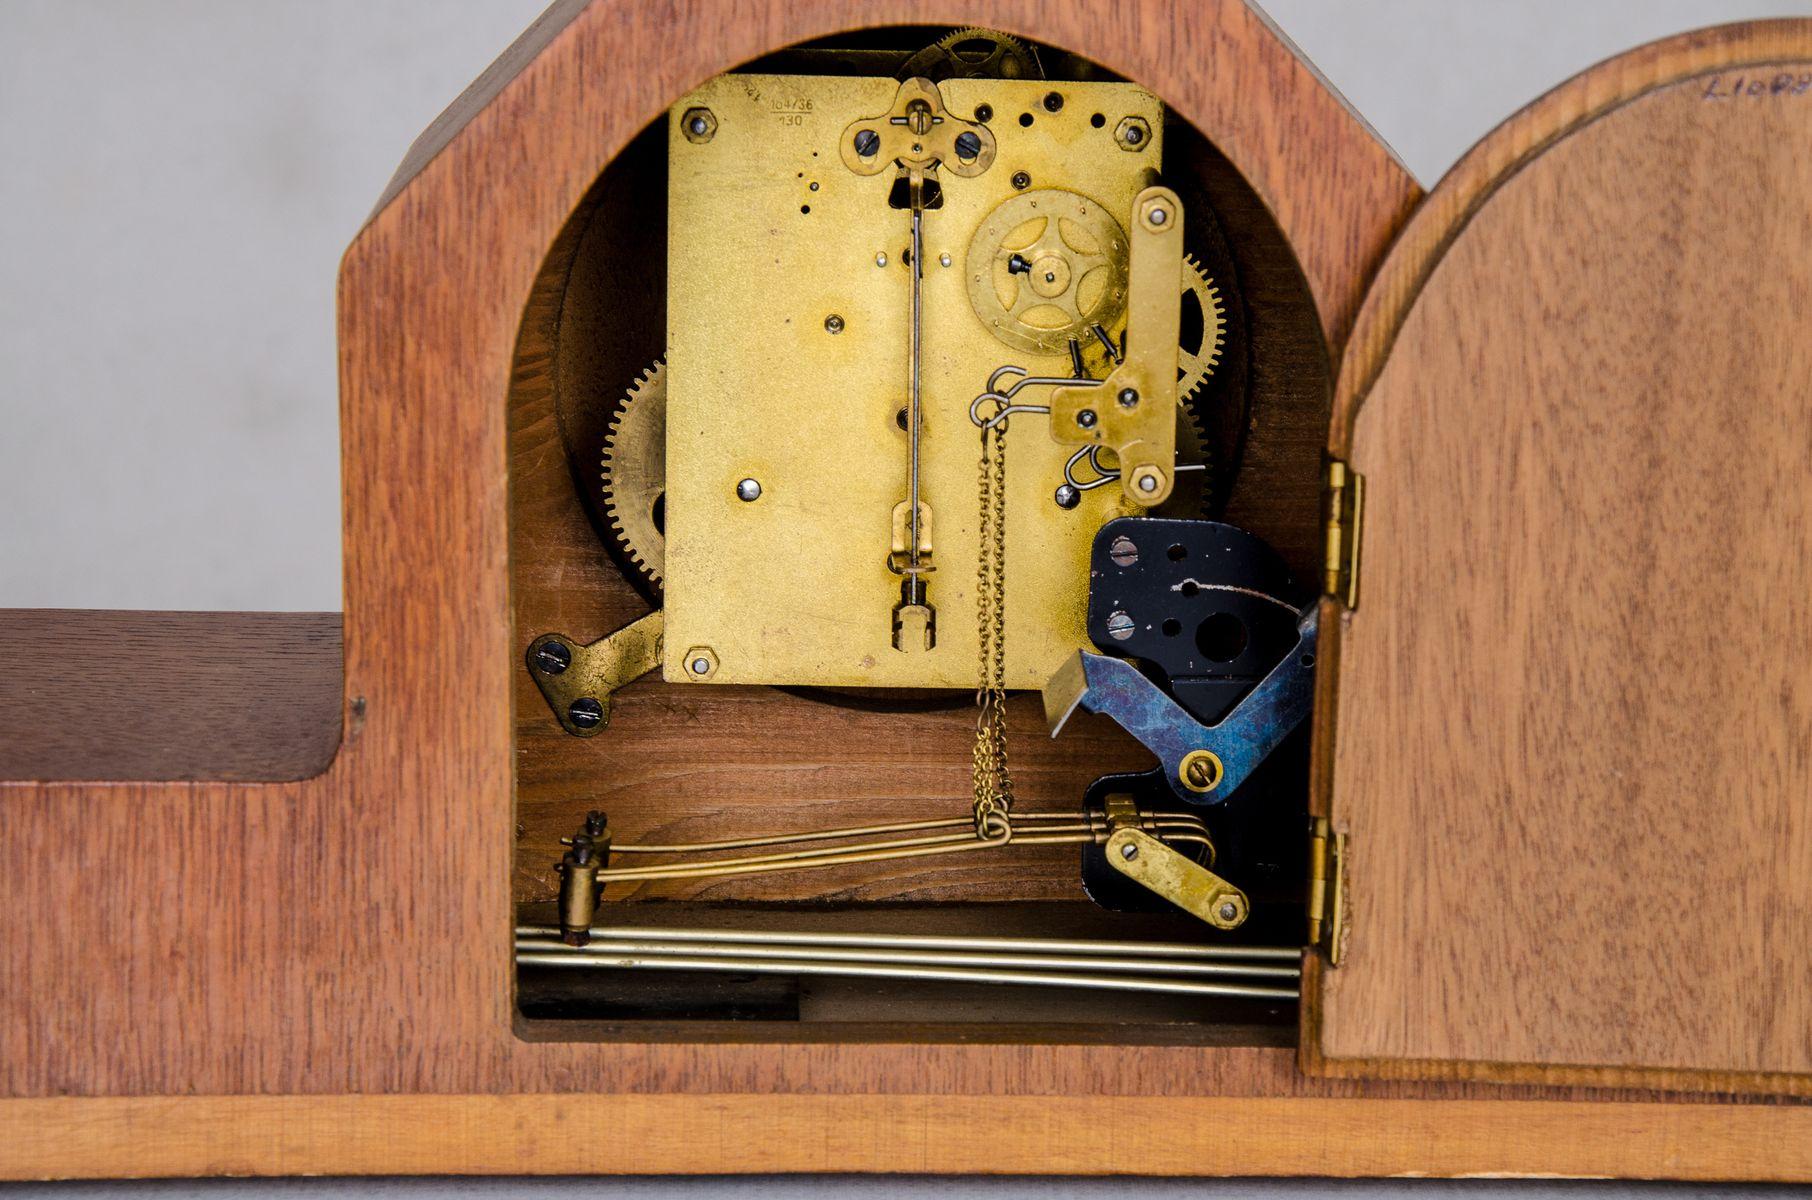 Amazing Art Deco Wall Clock Contemporary - The Wall Art Decorations ...